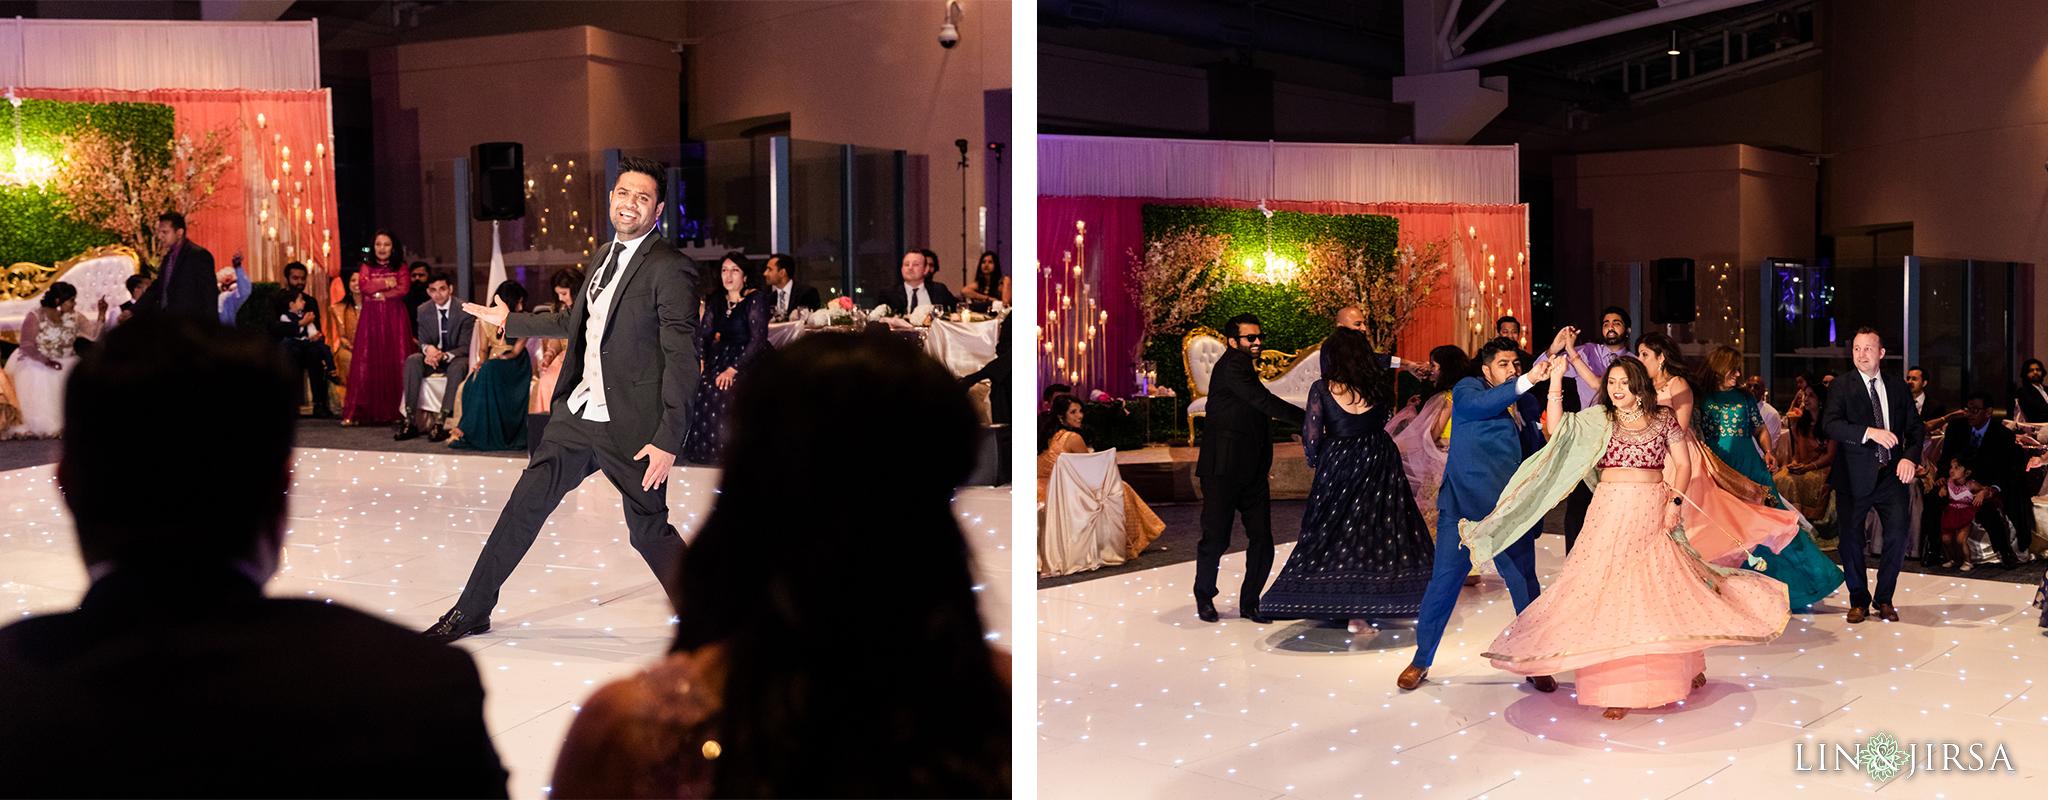 45 Delta Hotels Chesapeake Norfolk Virginia Indian Wedding Photography